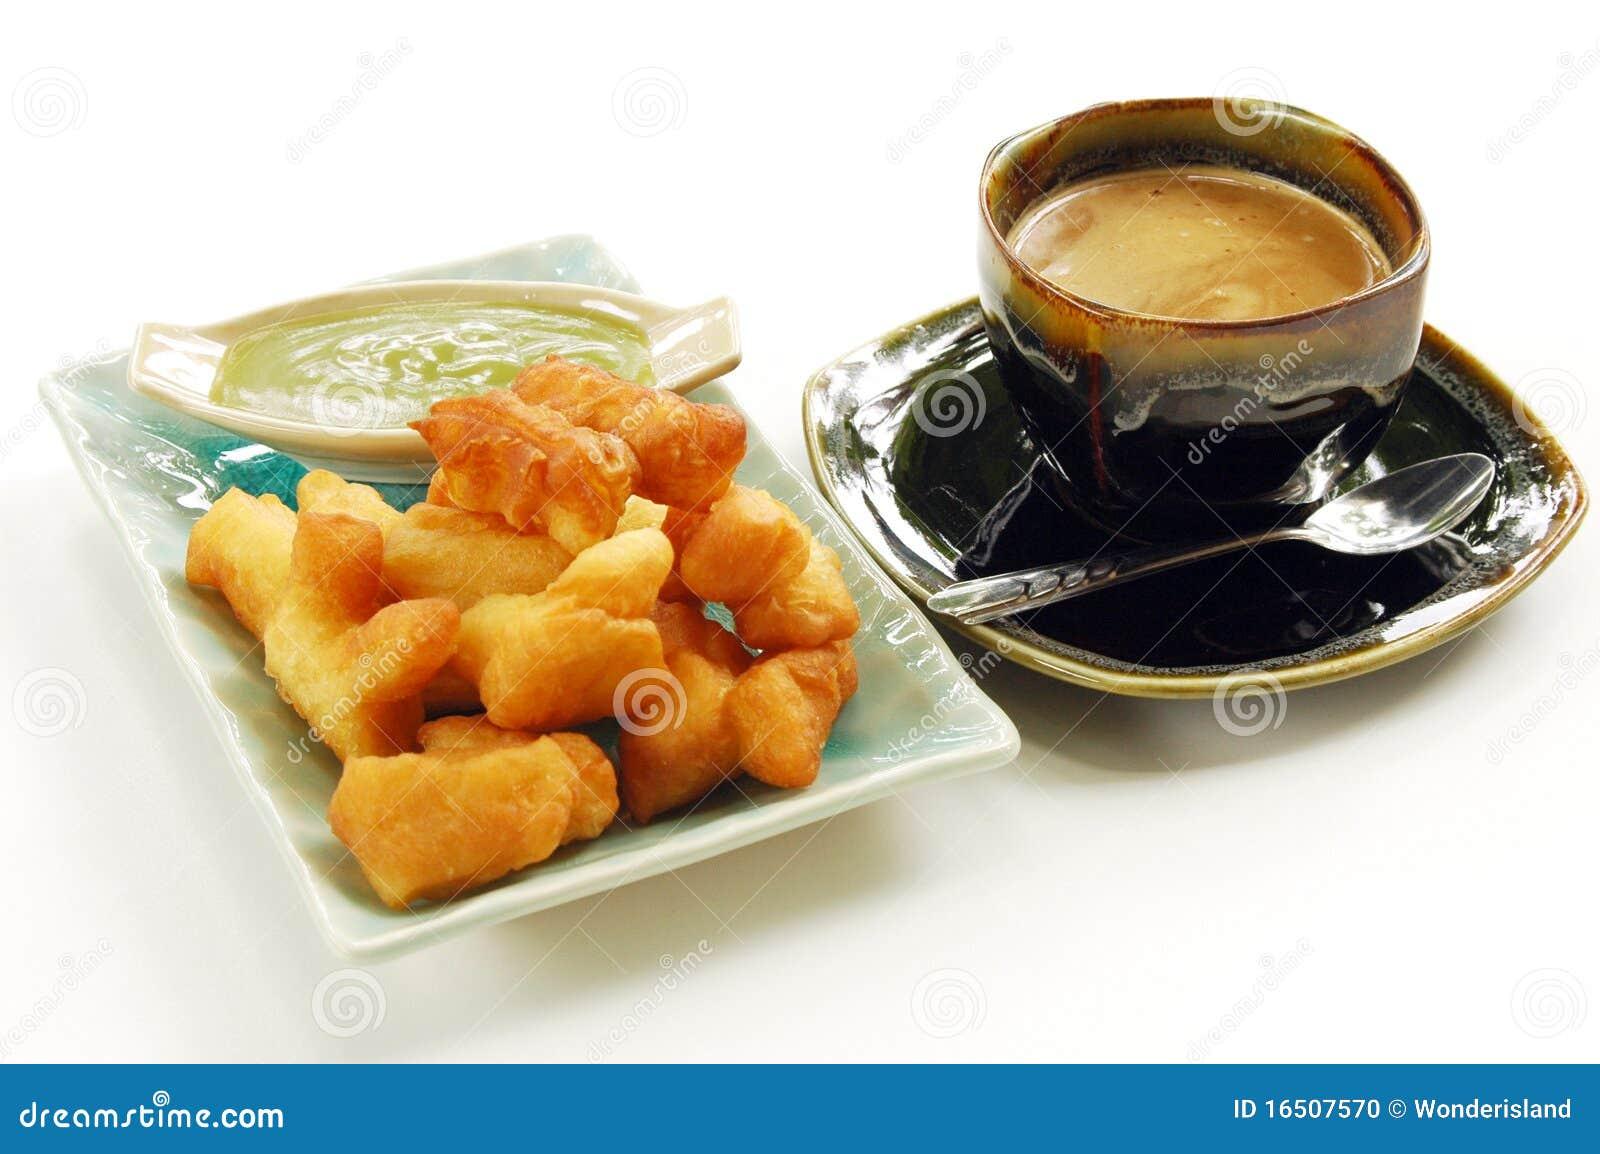 Deep-fried doughstick with local coffee